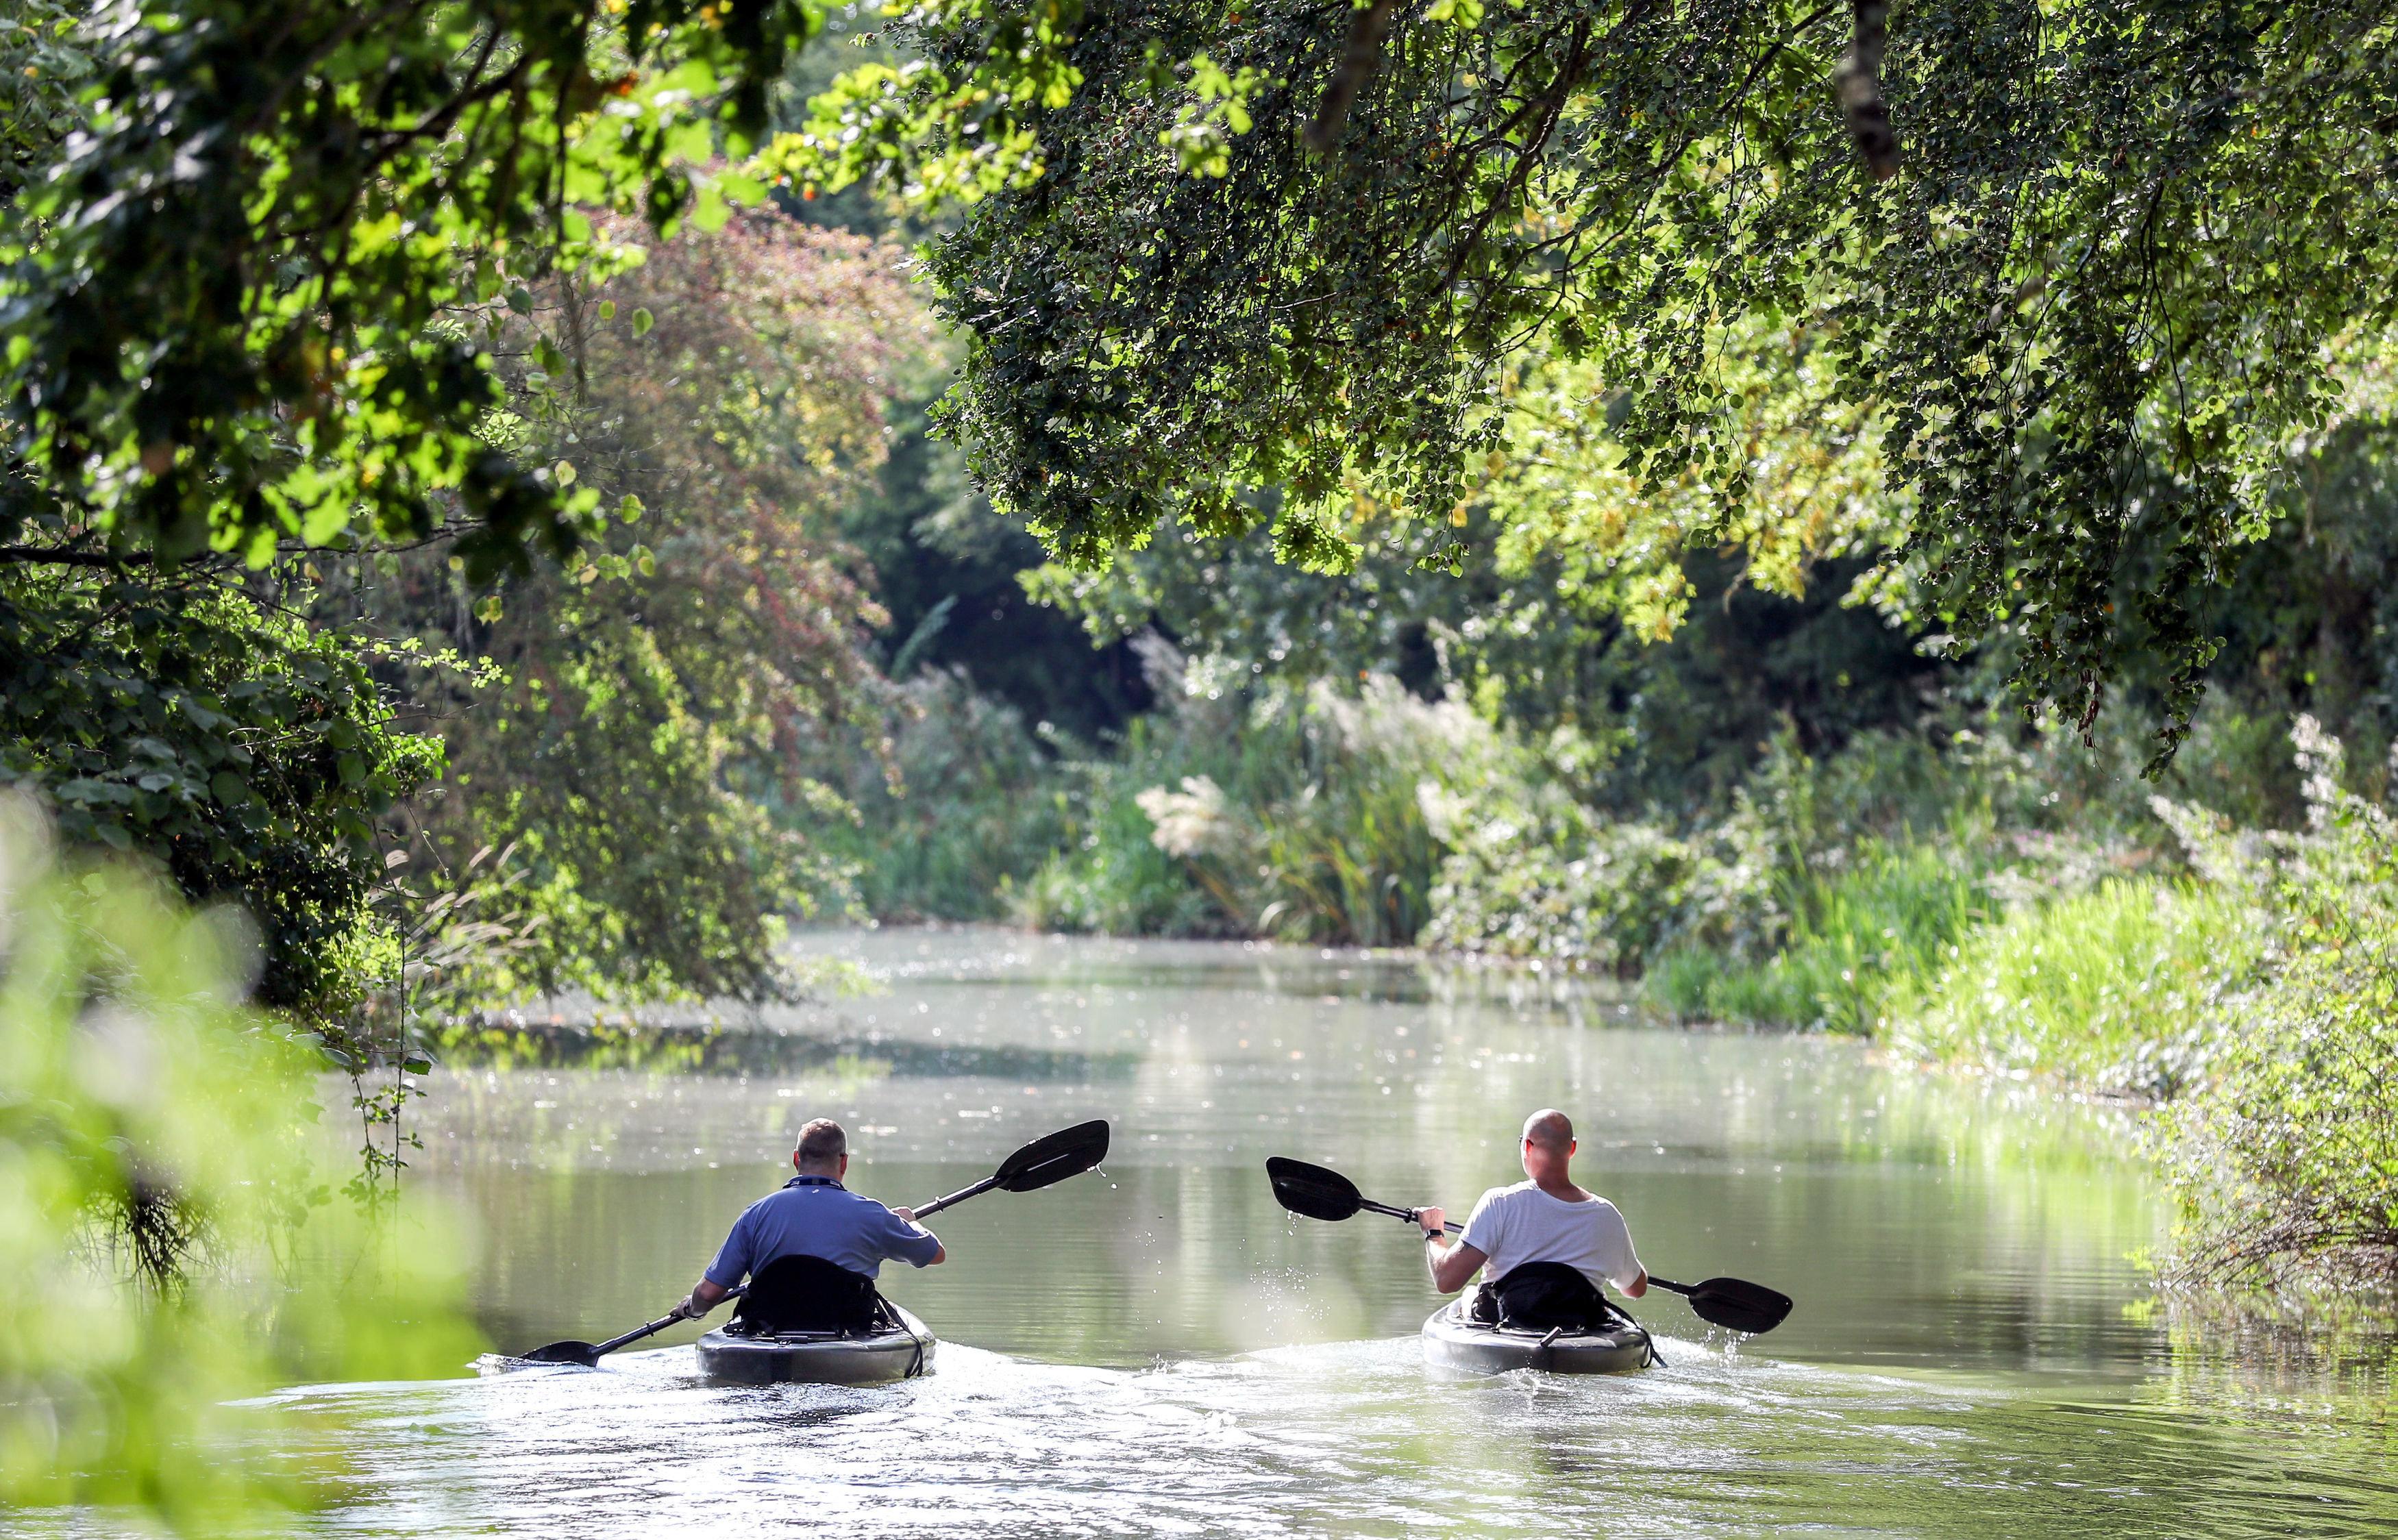 The Basingstoke canal, which runs through the borough of Rushmoor,